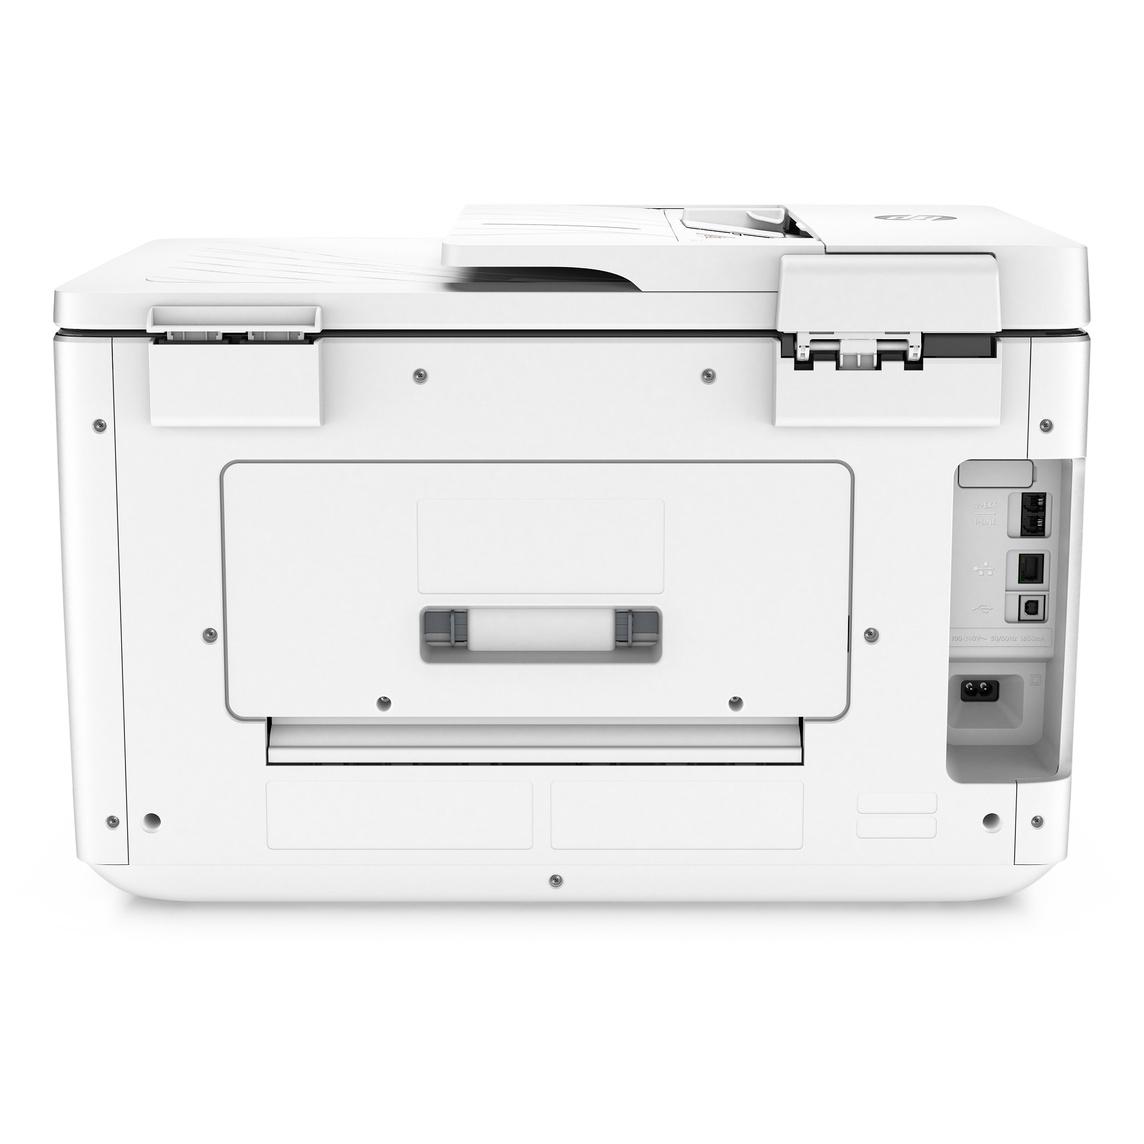 HP OfficeJet Pro 7740 All-in-One Wide Format Printer - Apple